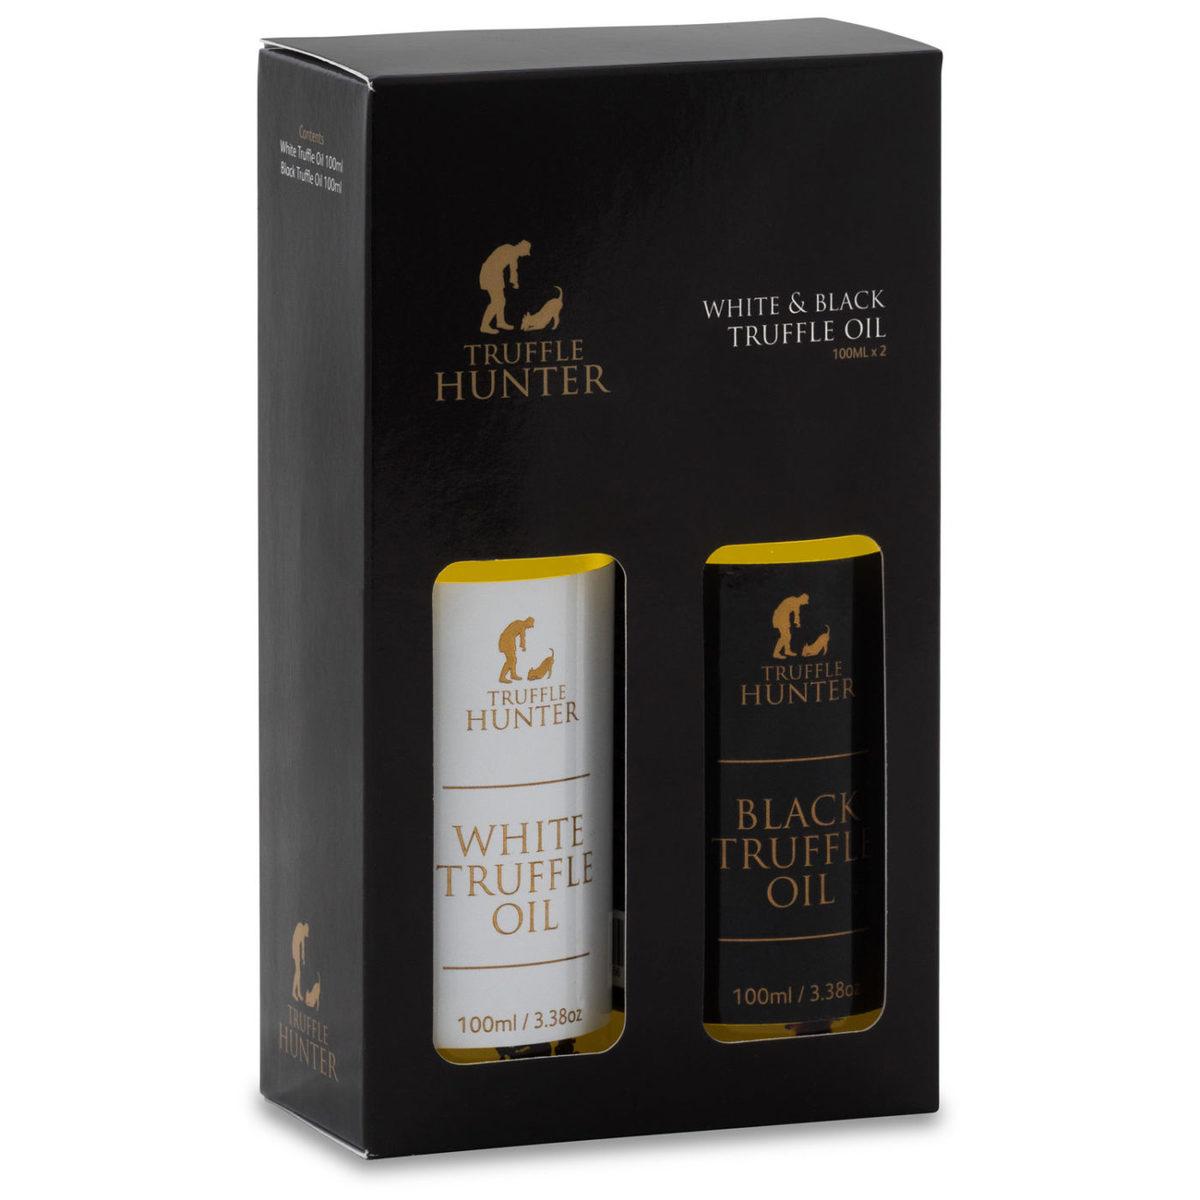 Black & White Truffle Oil Selection 100ml * 2